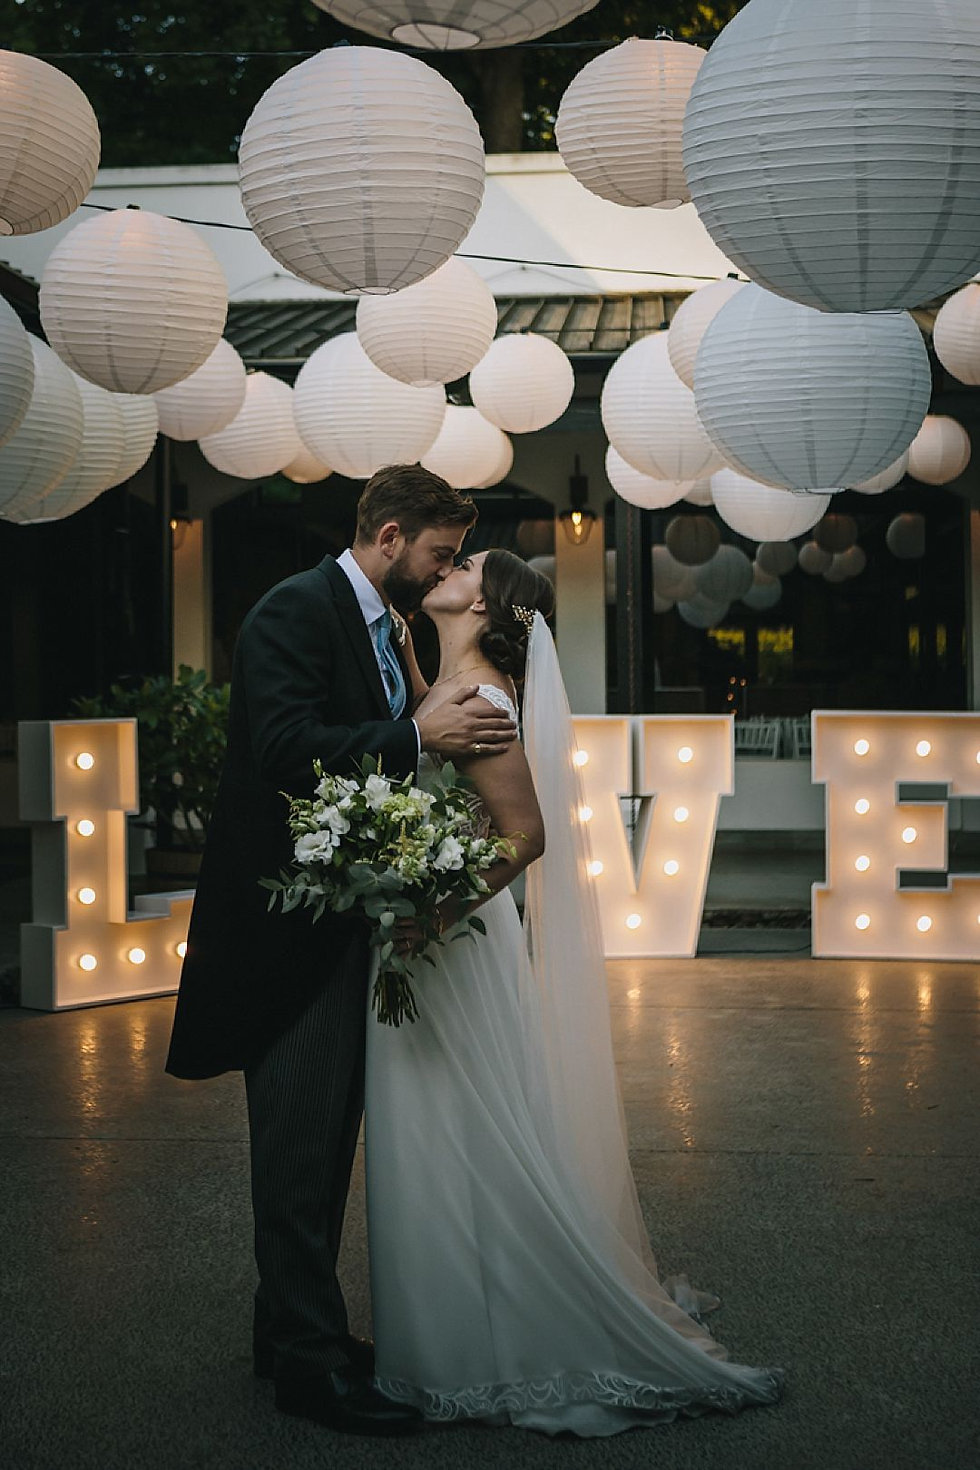 Love lights hire Cape Town